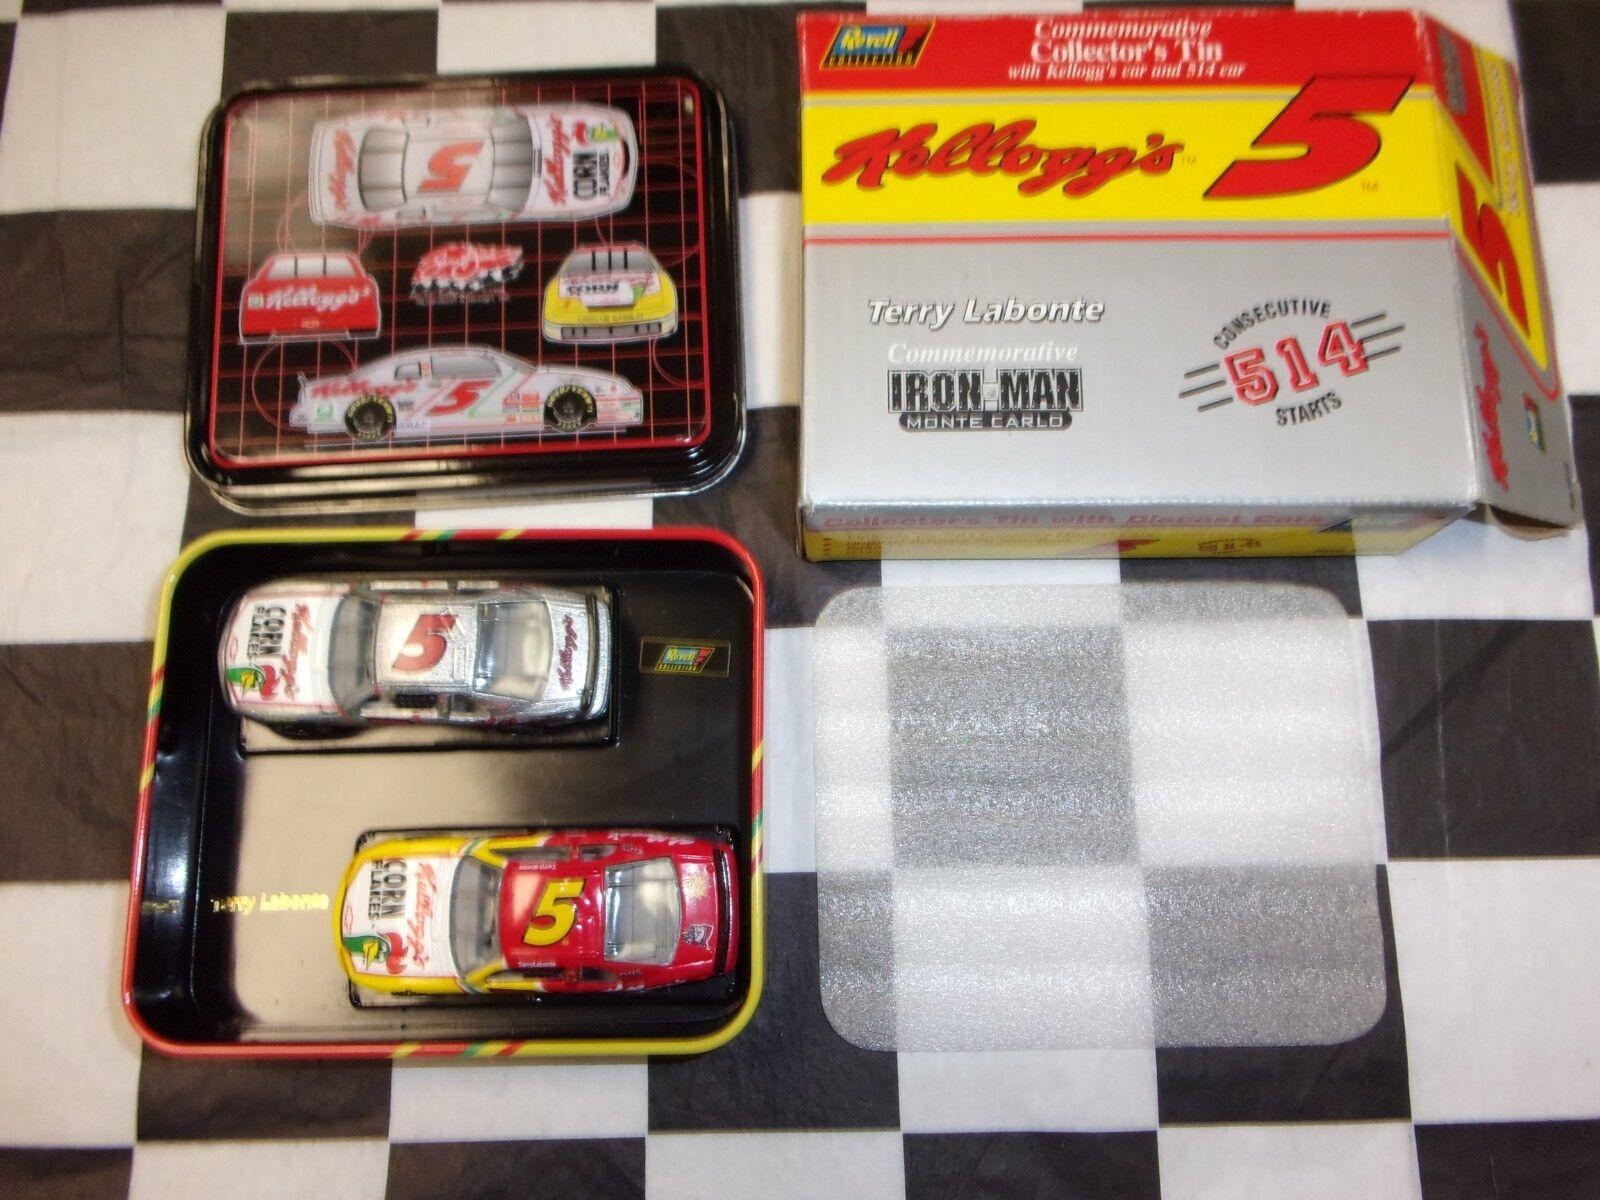 Terry Labonte Iron Man 2 car tin Starts Commemorative NASCAR